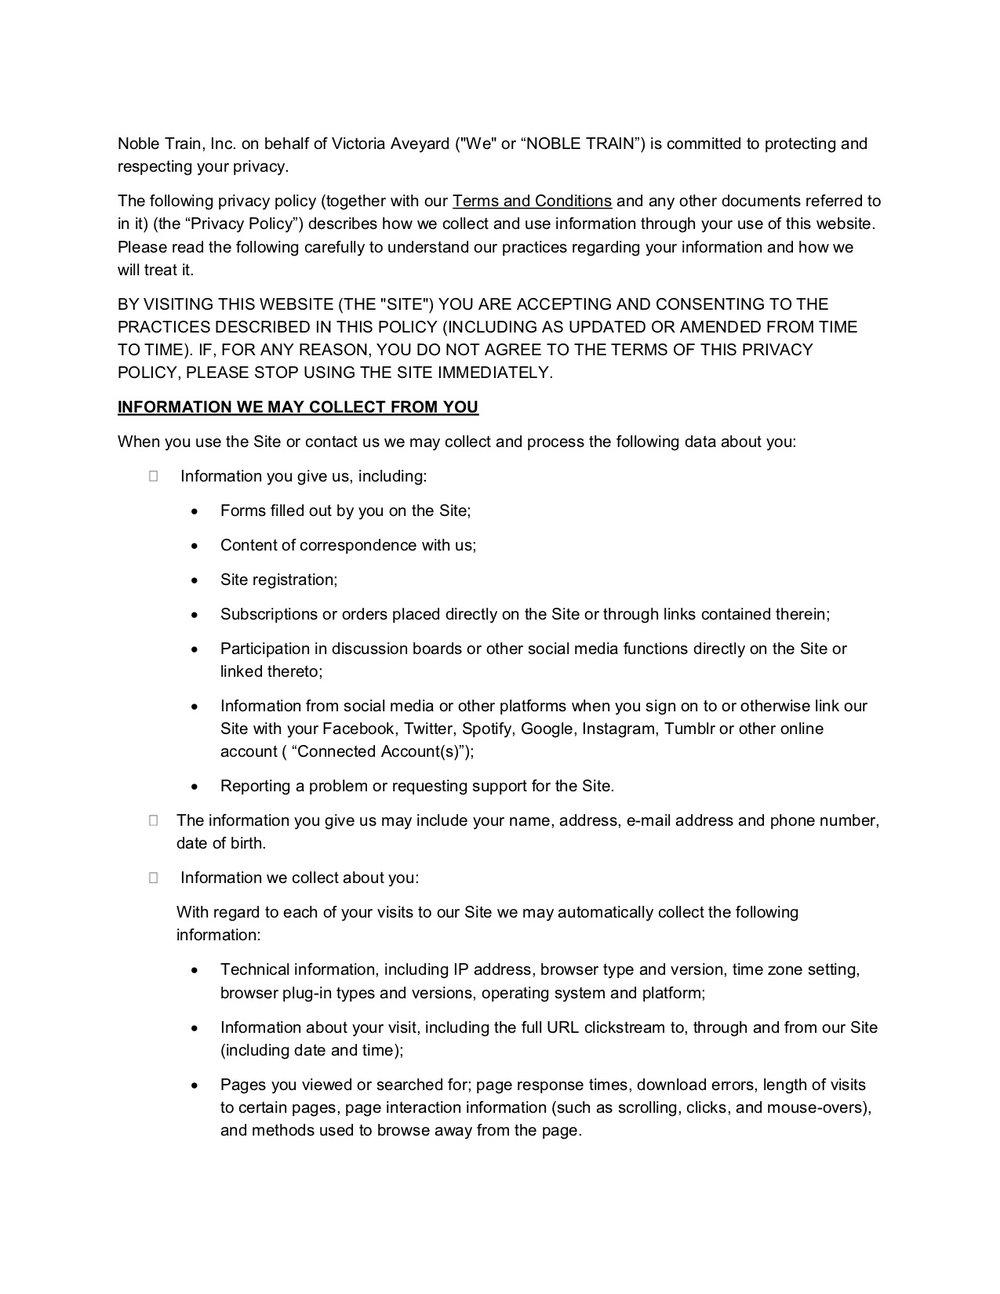 Victoria Aveyard - Website Privacy Policy.jpg